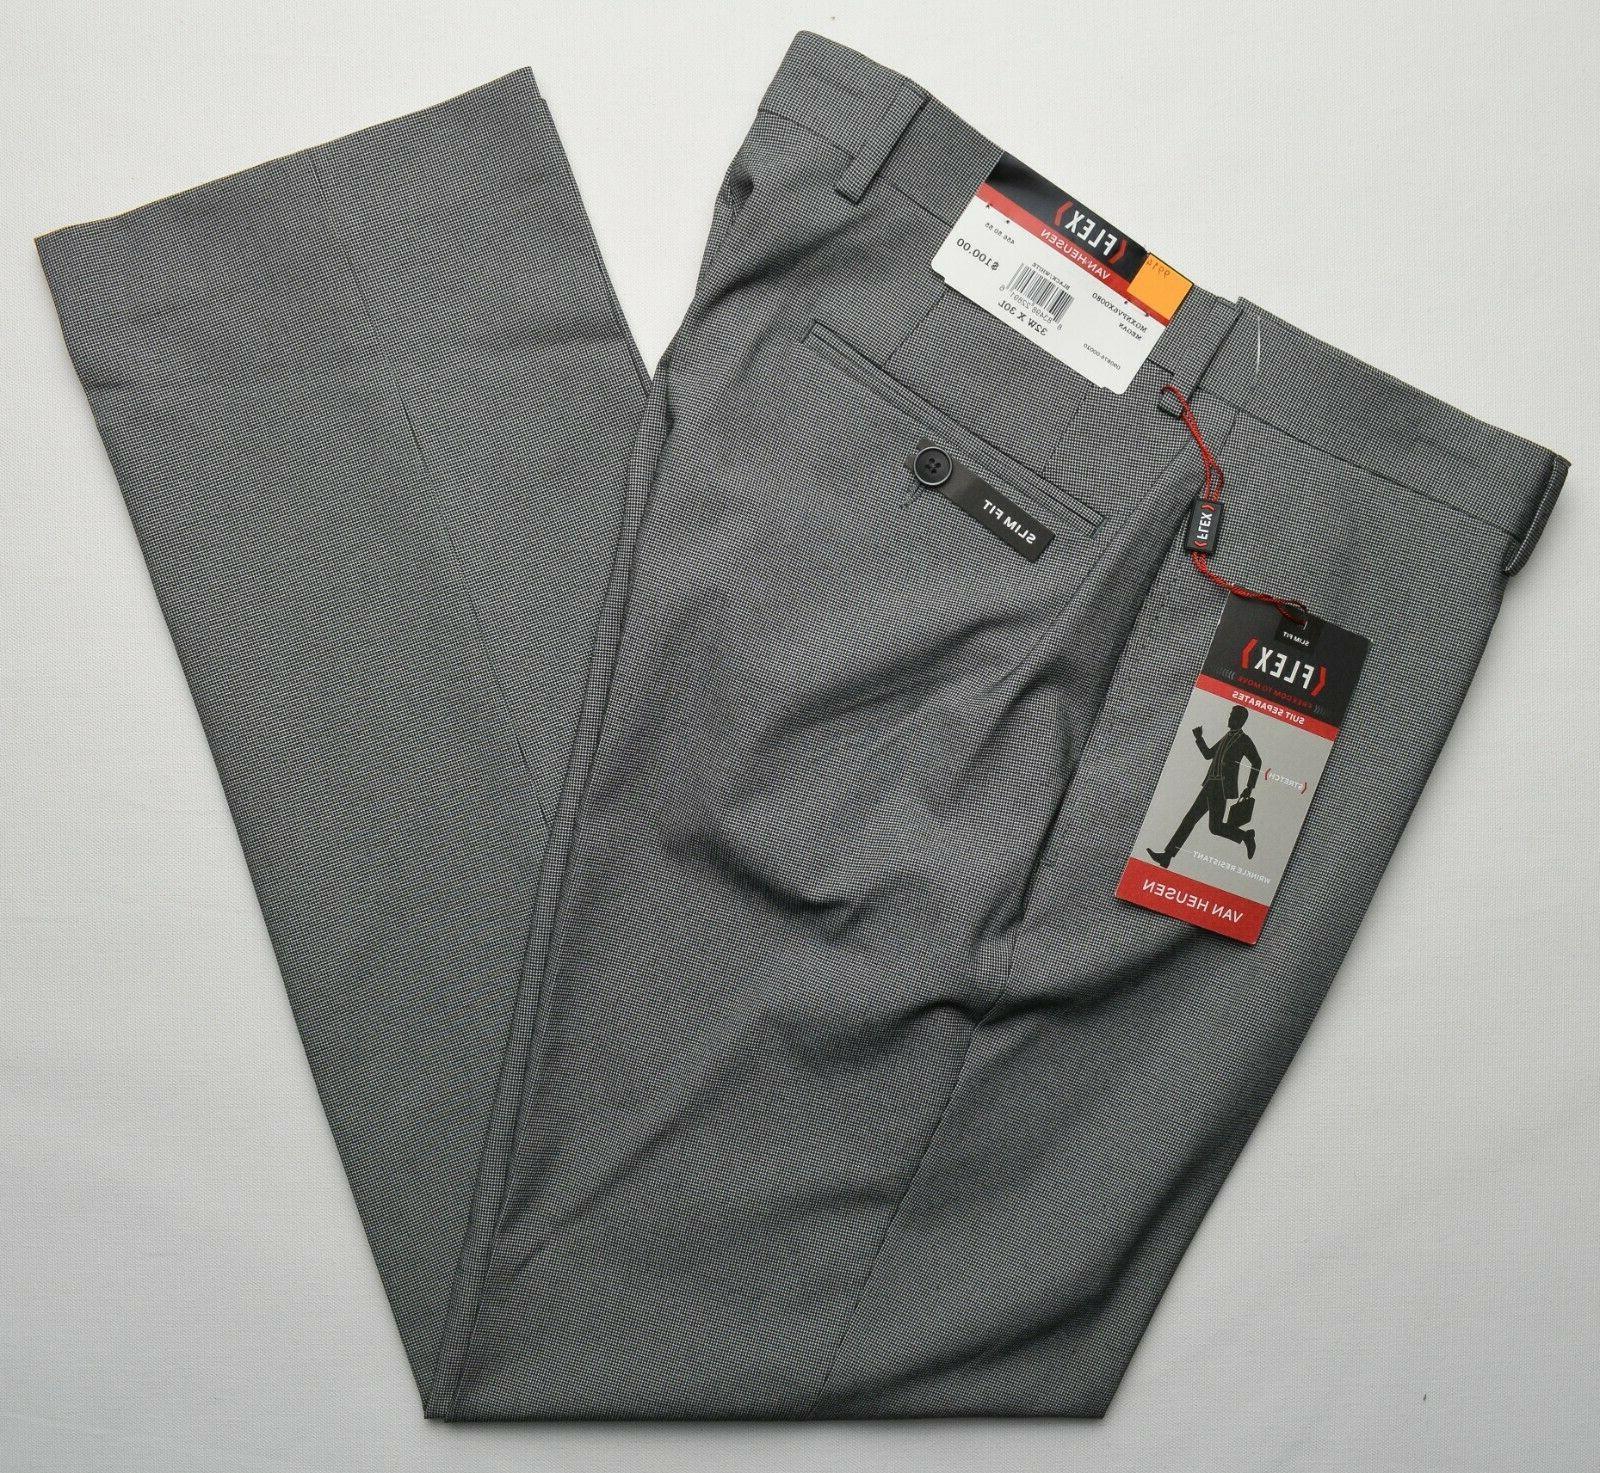 9914 new men flat front slim fit